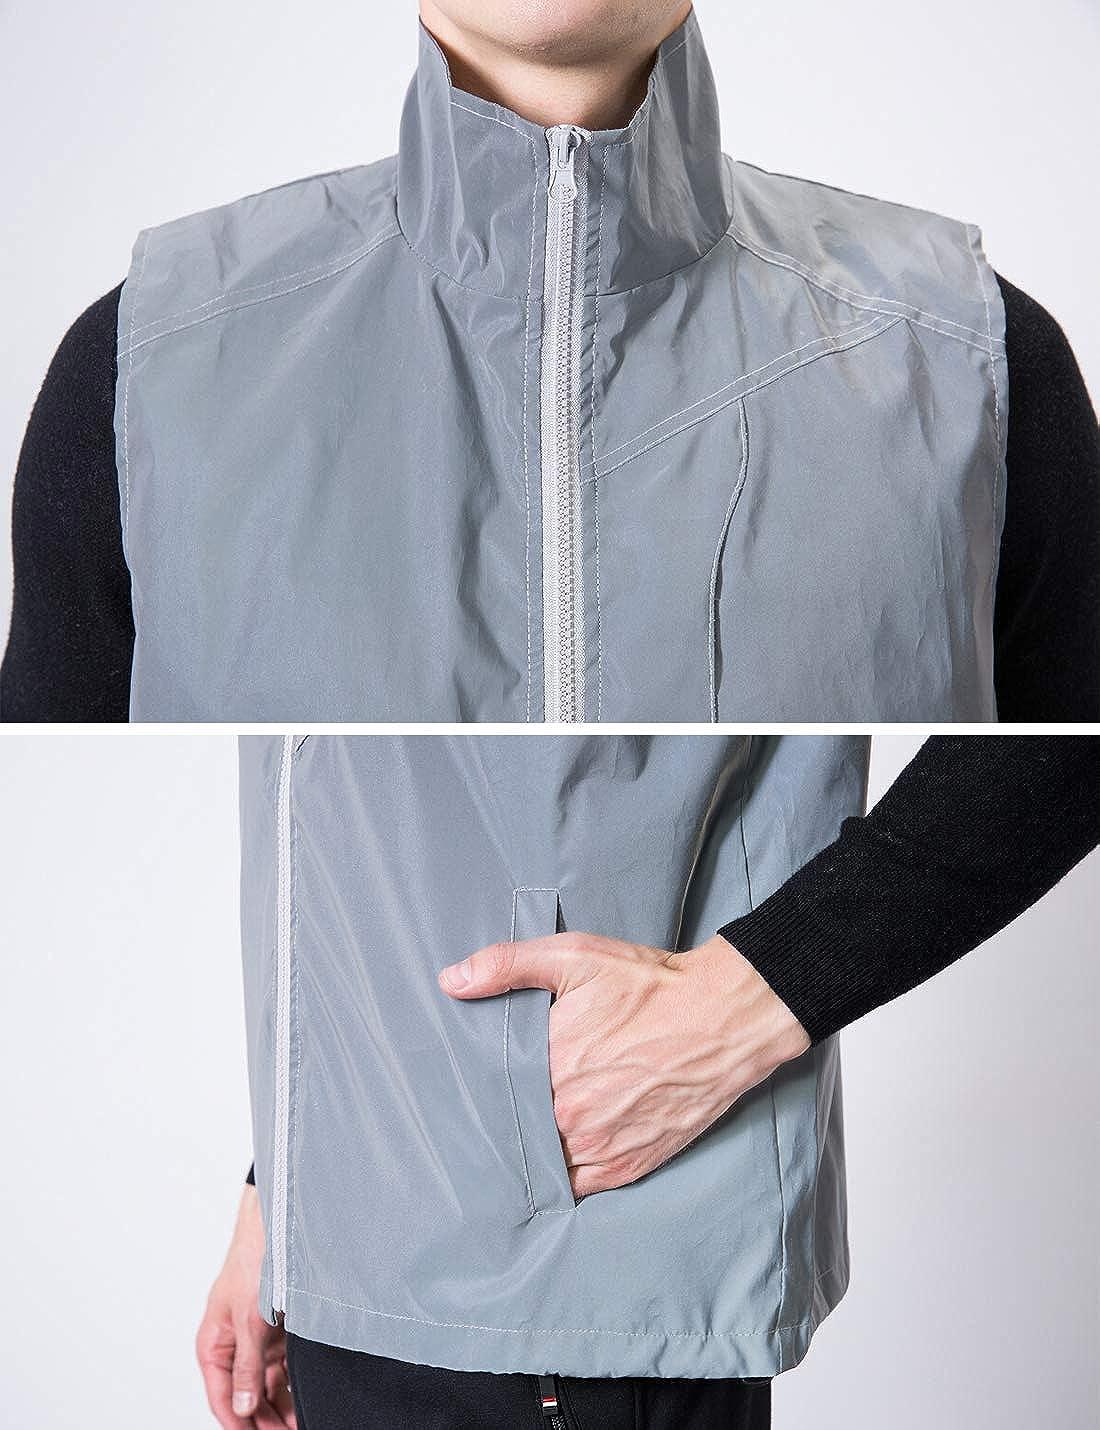 PAODIKUAI Men's Reflective Vest Outdoor Running Cycling Walking Biker Safety Vest